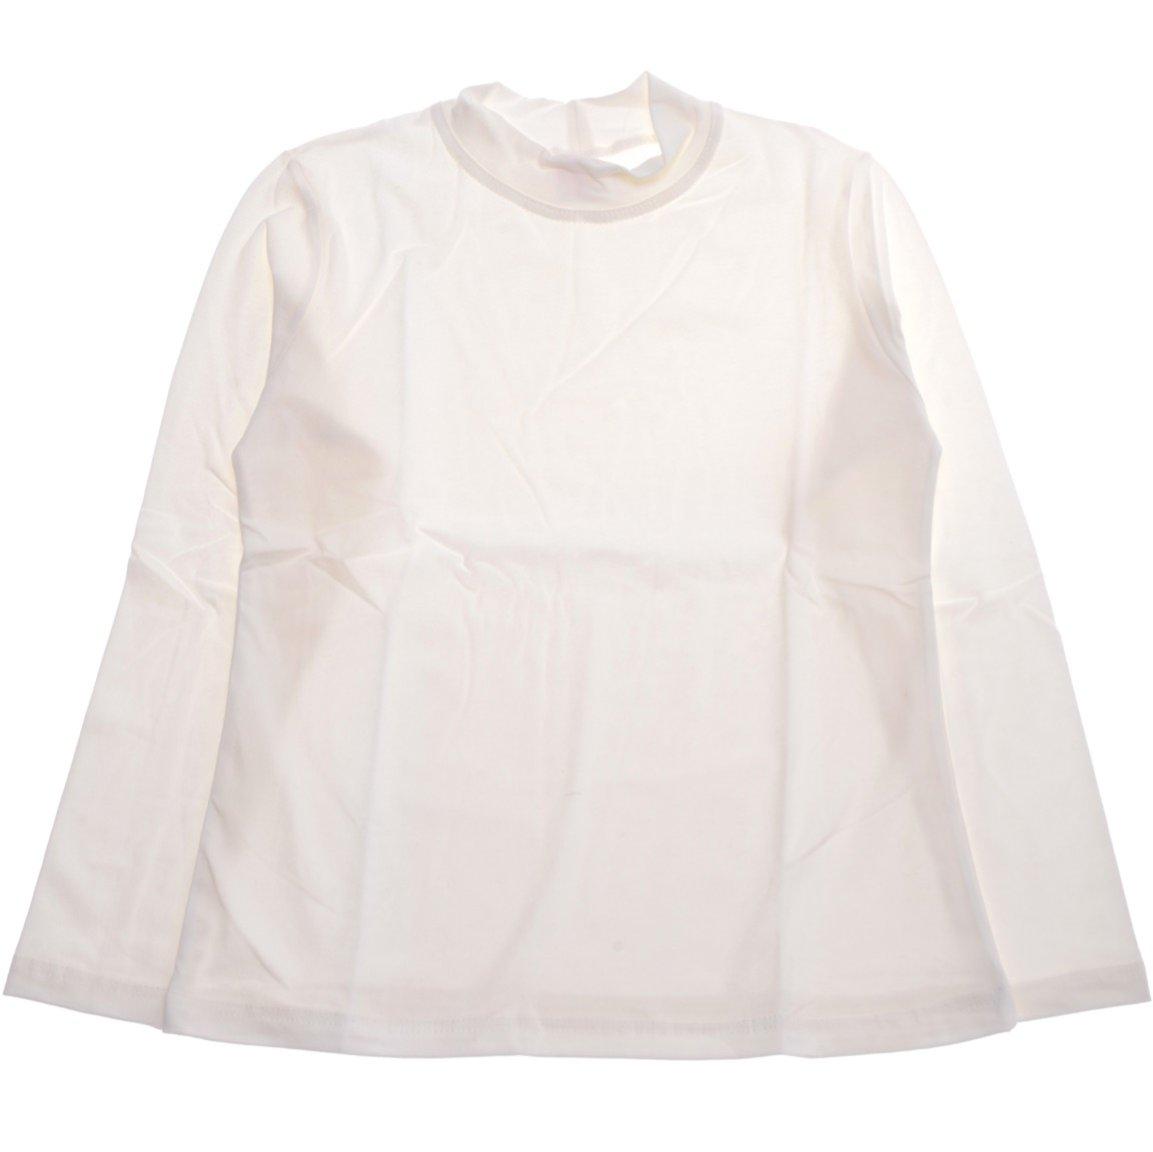 Joyce παιδική εποχιακή μπλούζα «Ecru Stability»